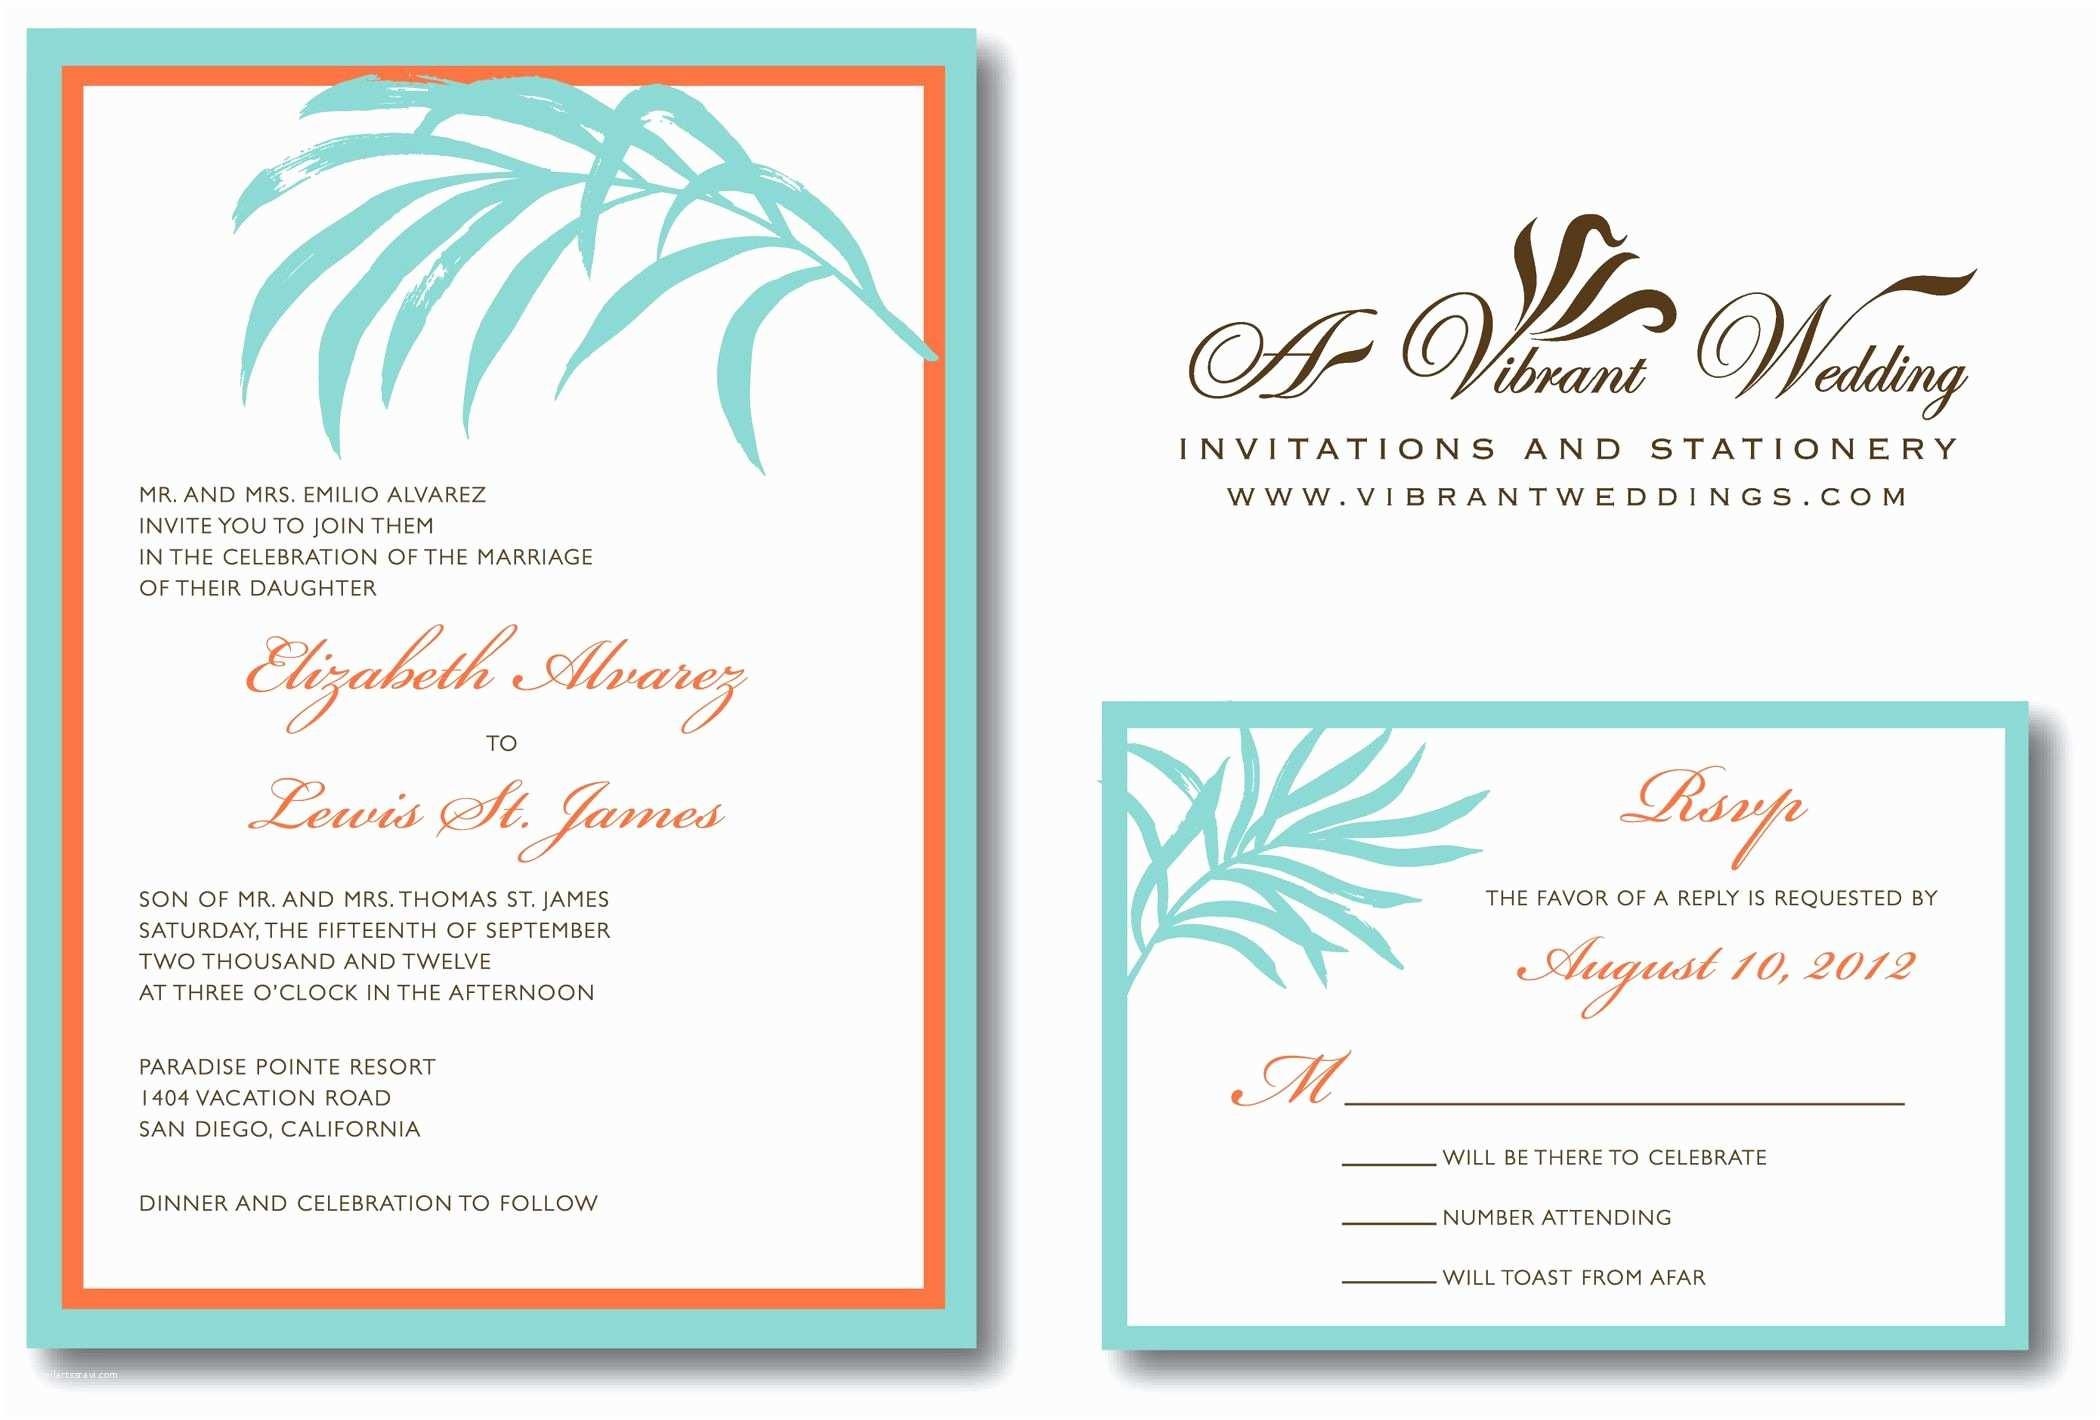 Spanish Wedding Invitations Spanish Wedding Invitation Templates Various Invitation